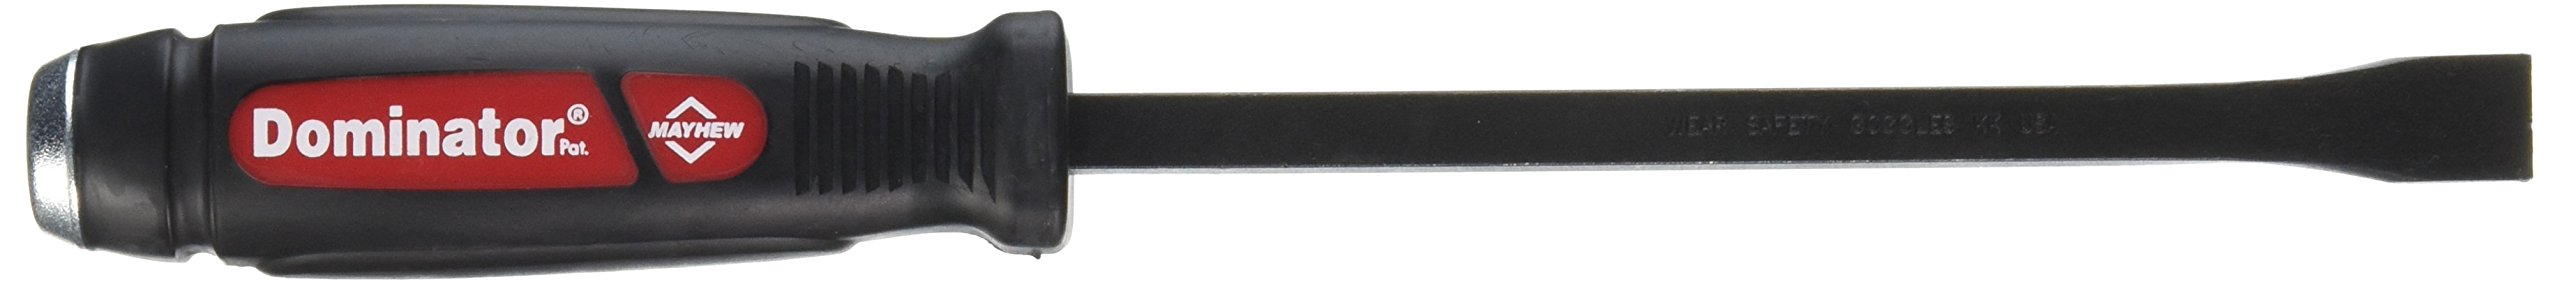 Mayhew 60140 7-C Dominator Pry Bar, Curved, 12-Inch OAL